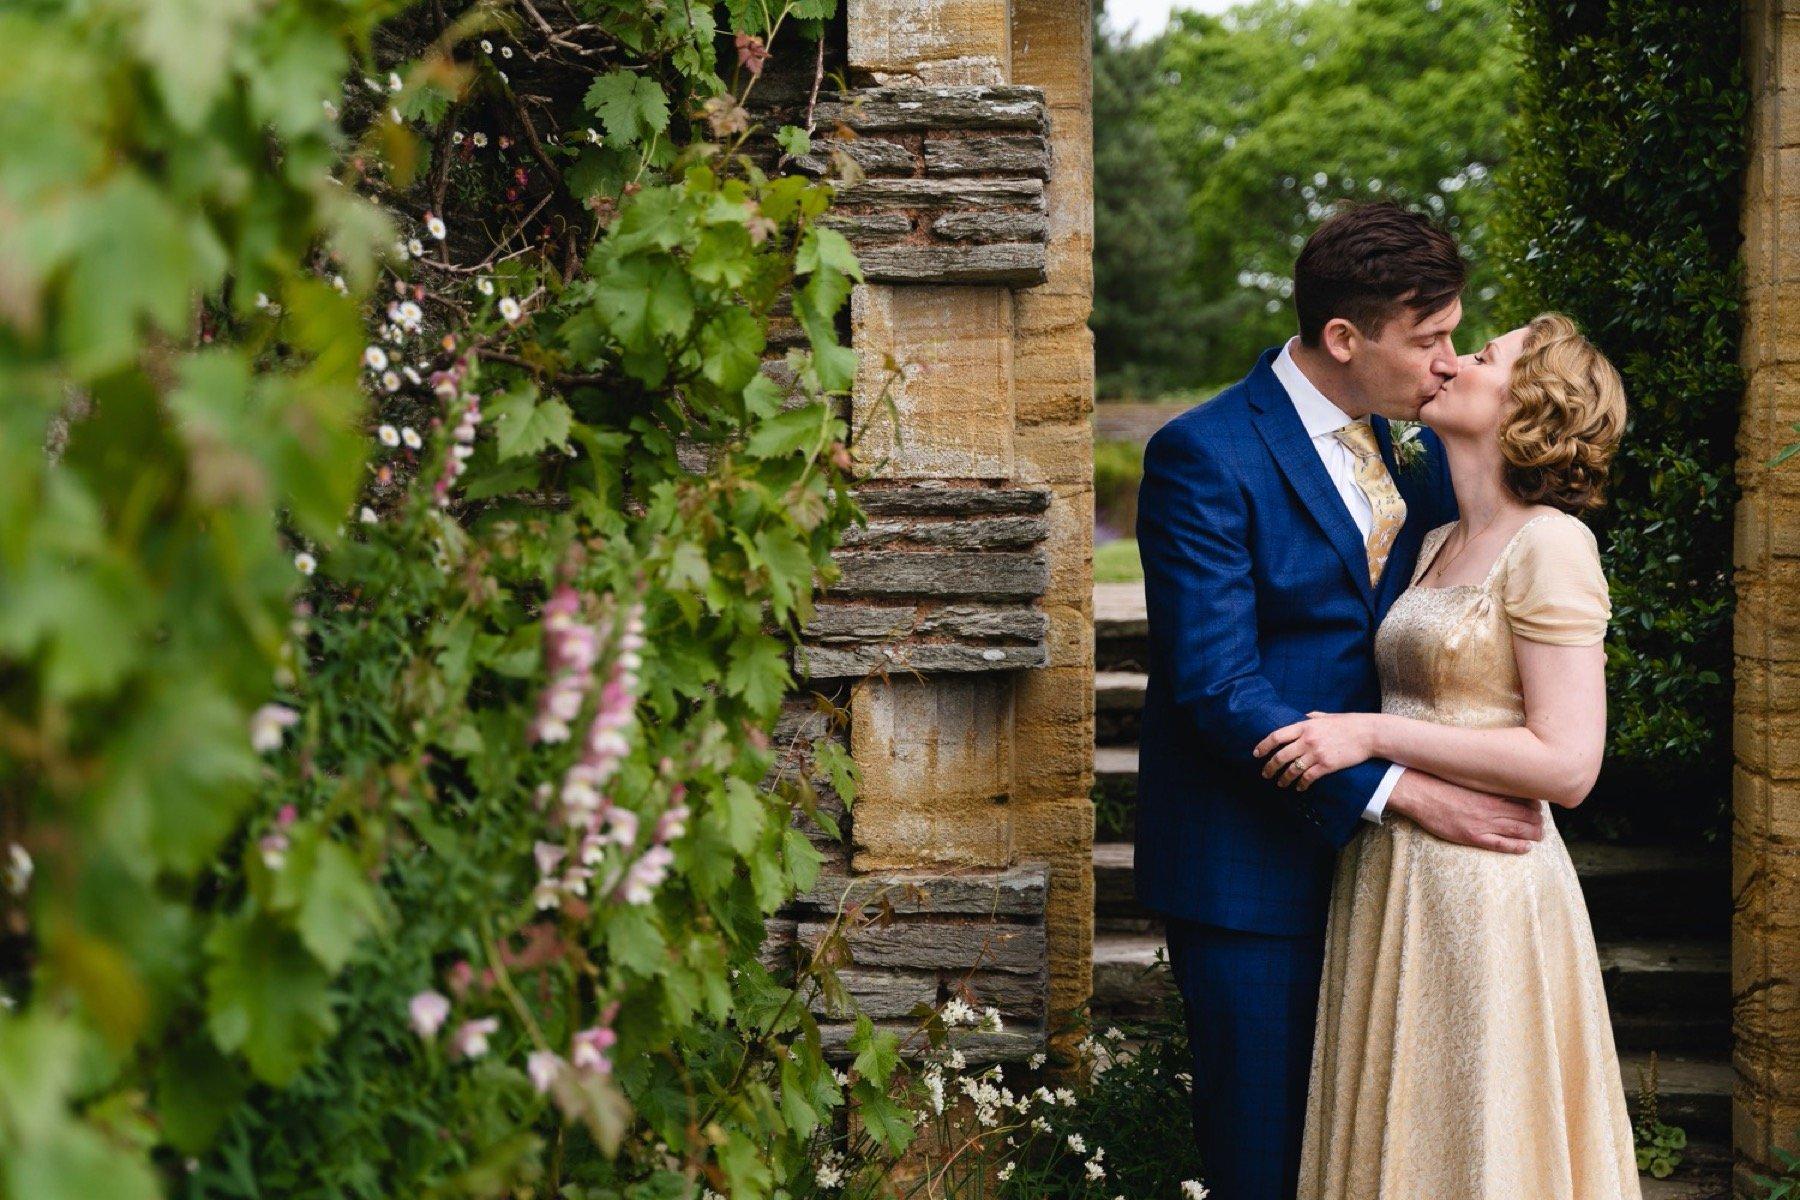 wedding portraits at hestercombe gardens